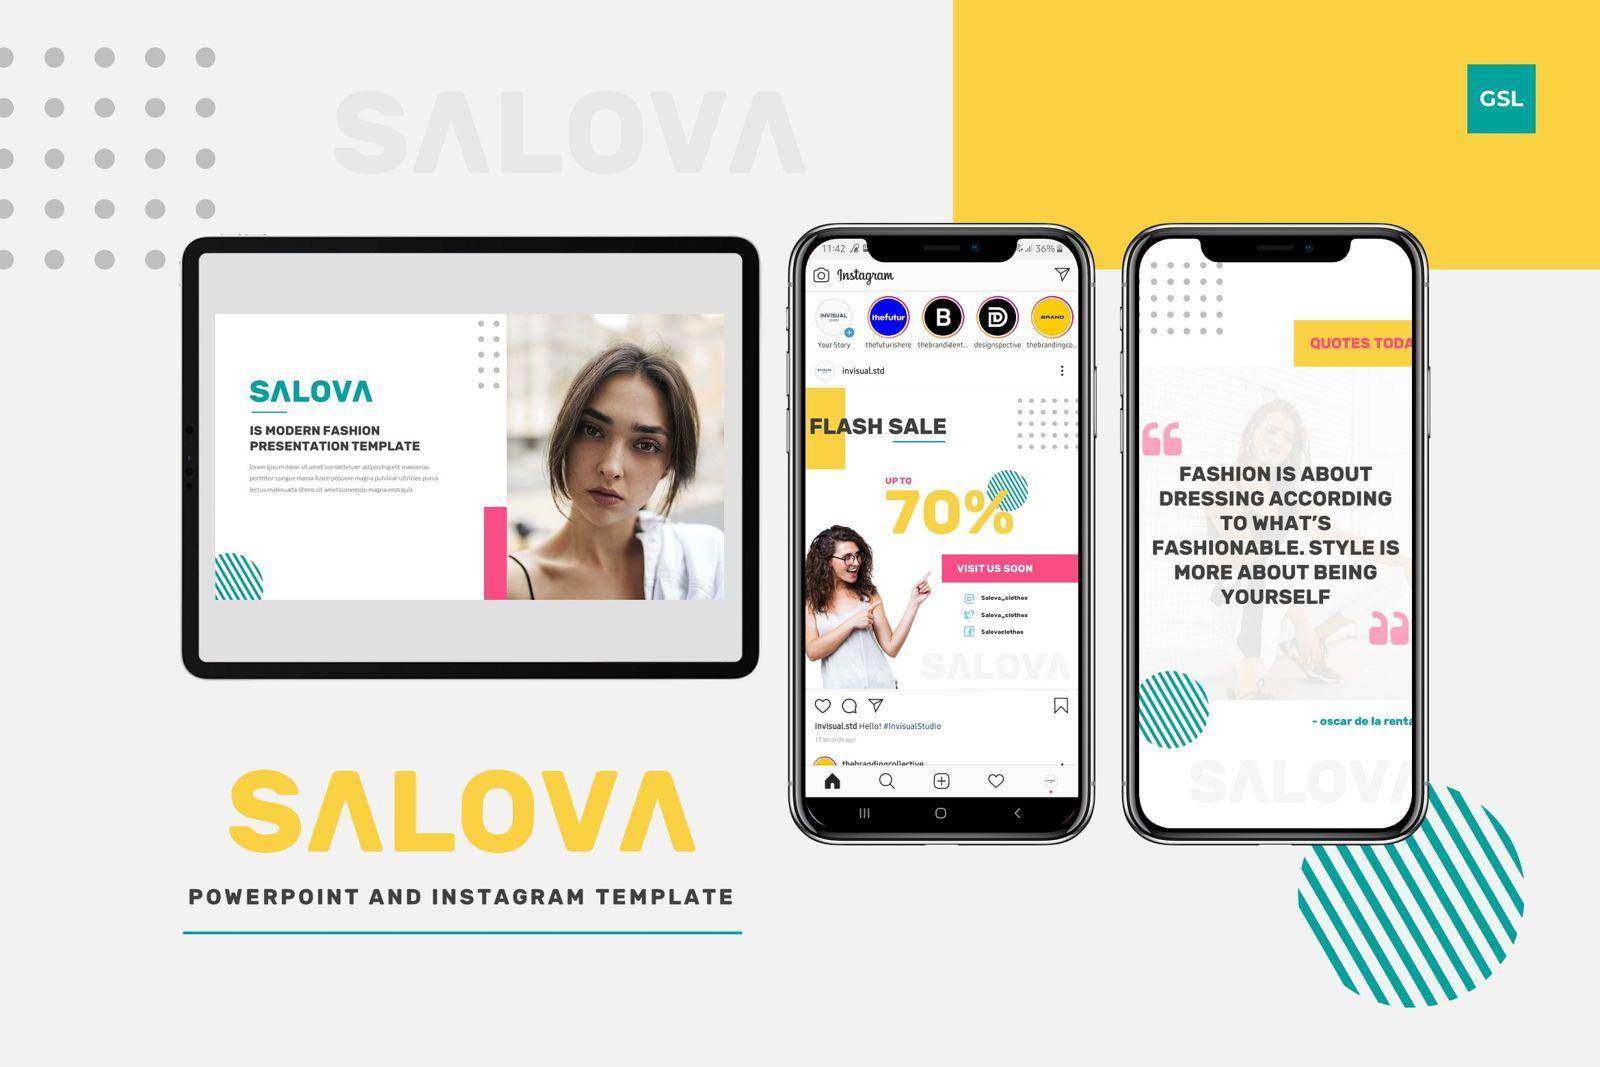 Salova - Google Slides Template, 07981, Presentation Templates — PoweredTemplate.com